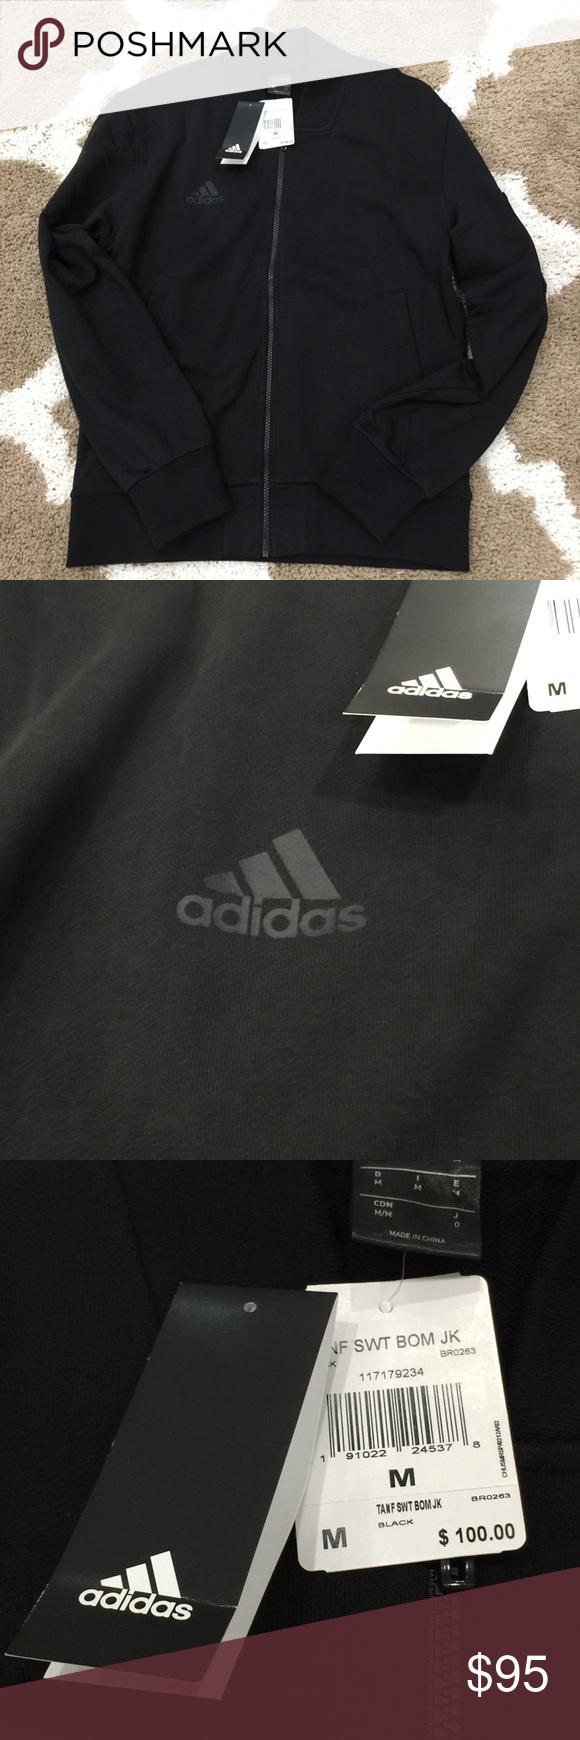 Adidas Tango Future Bomber Jacket Men's Black M This is a